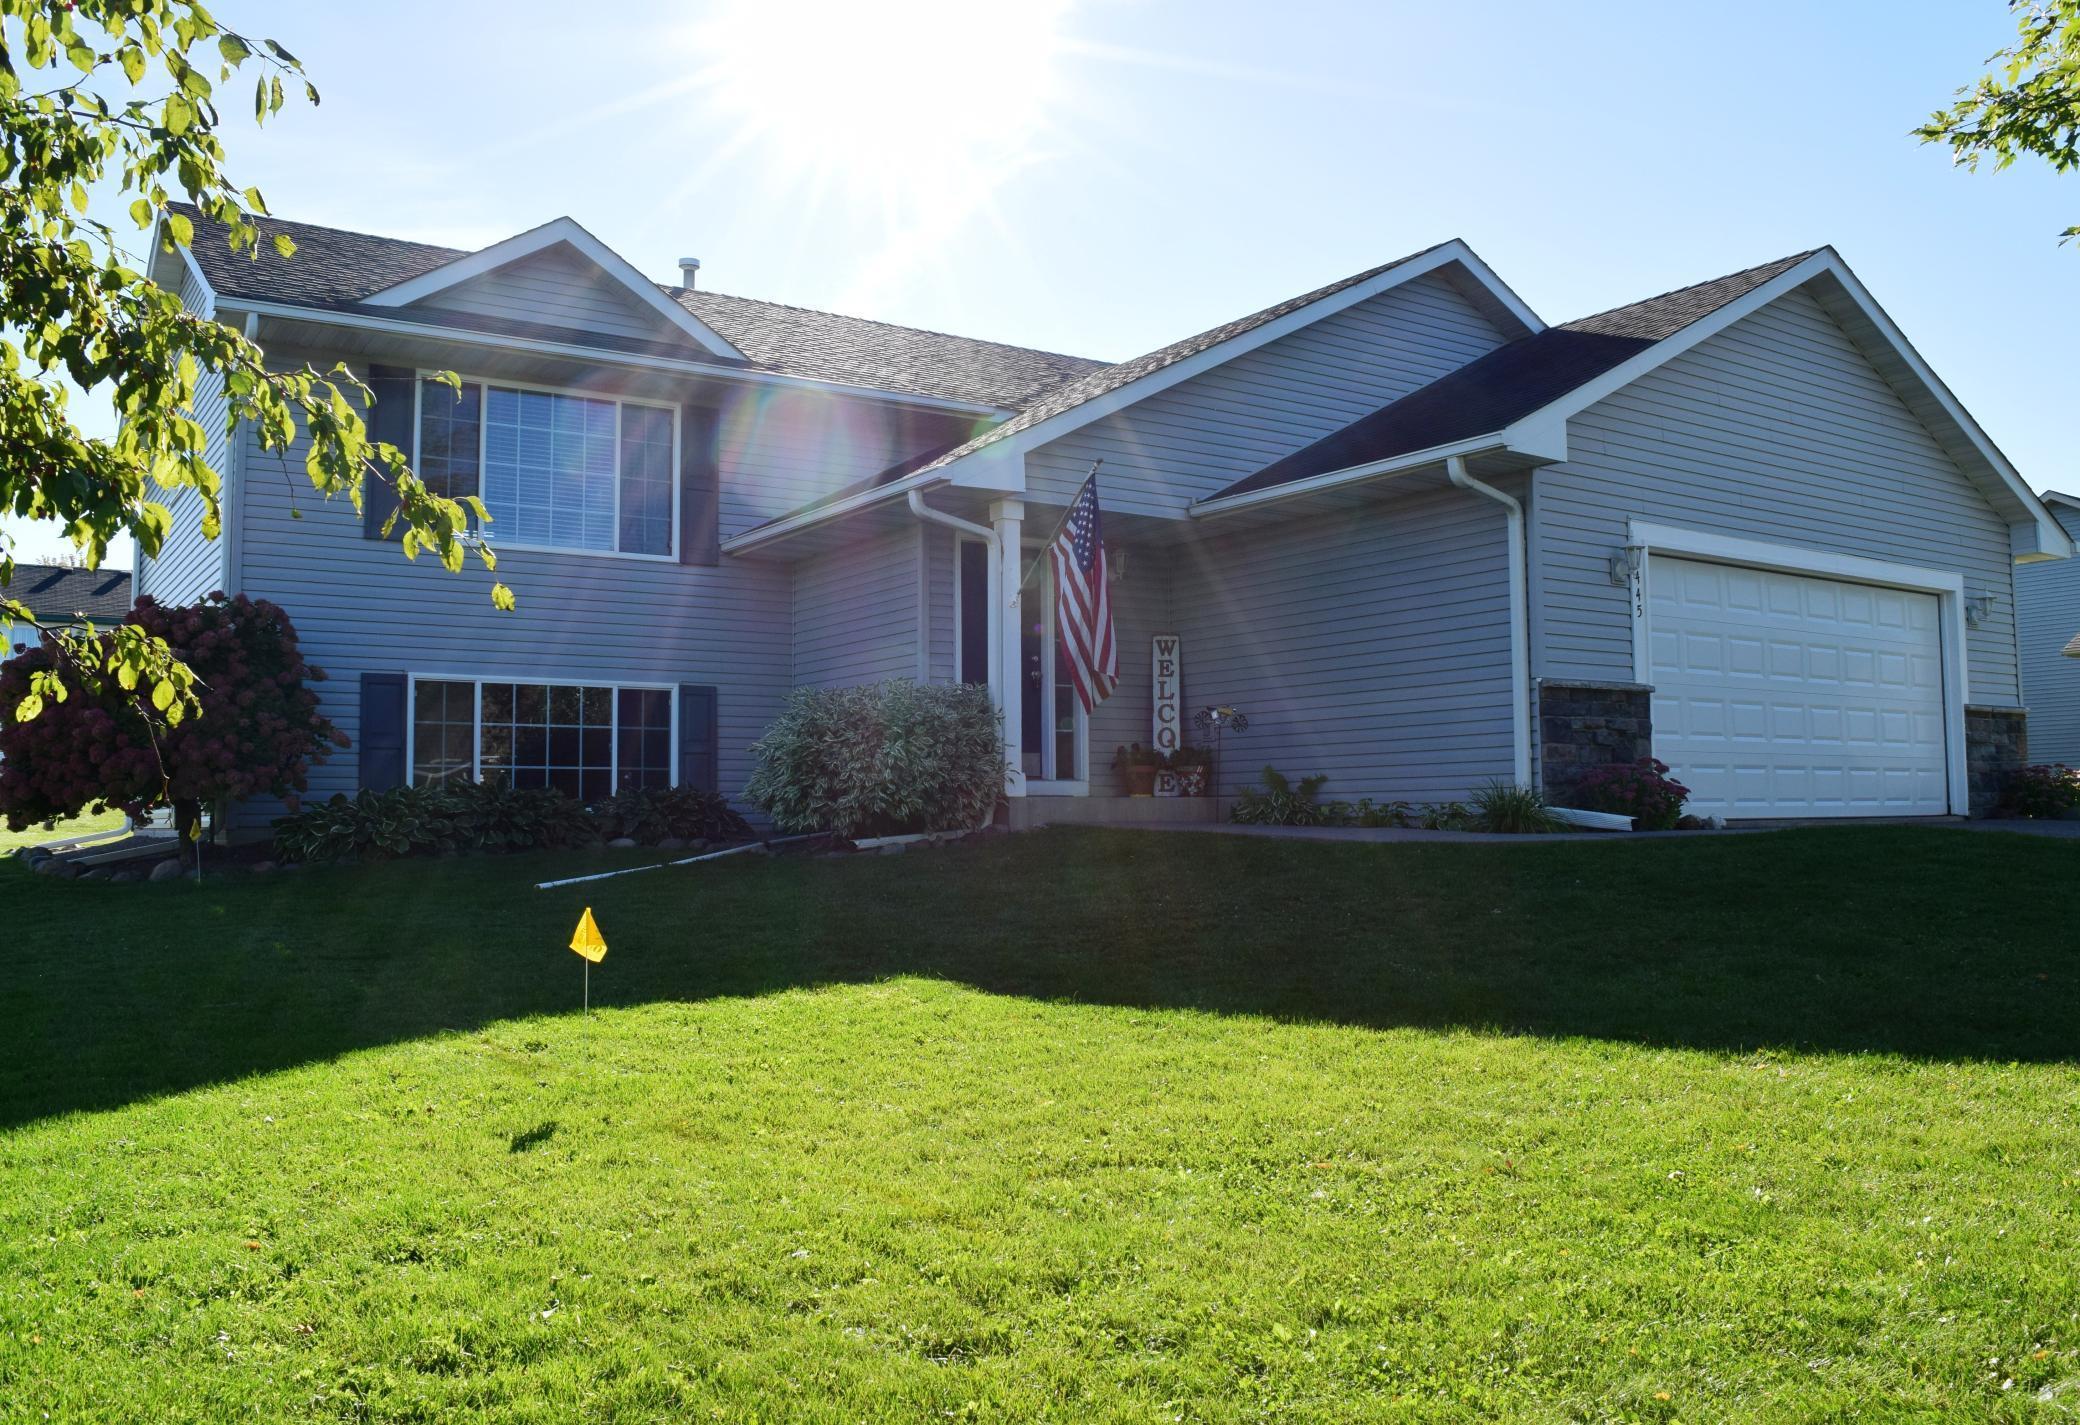 1445 4th Avenue Property Photo - Baldwin, WI real estate listing